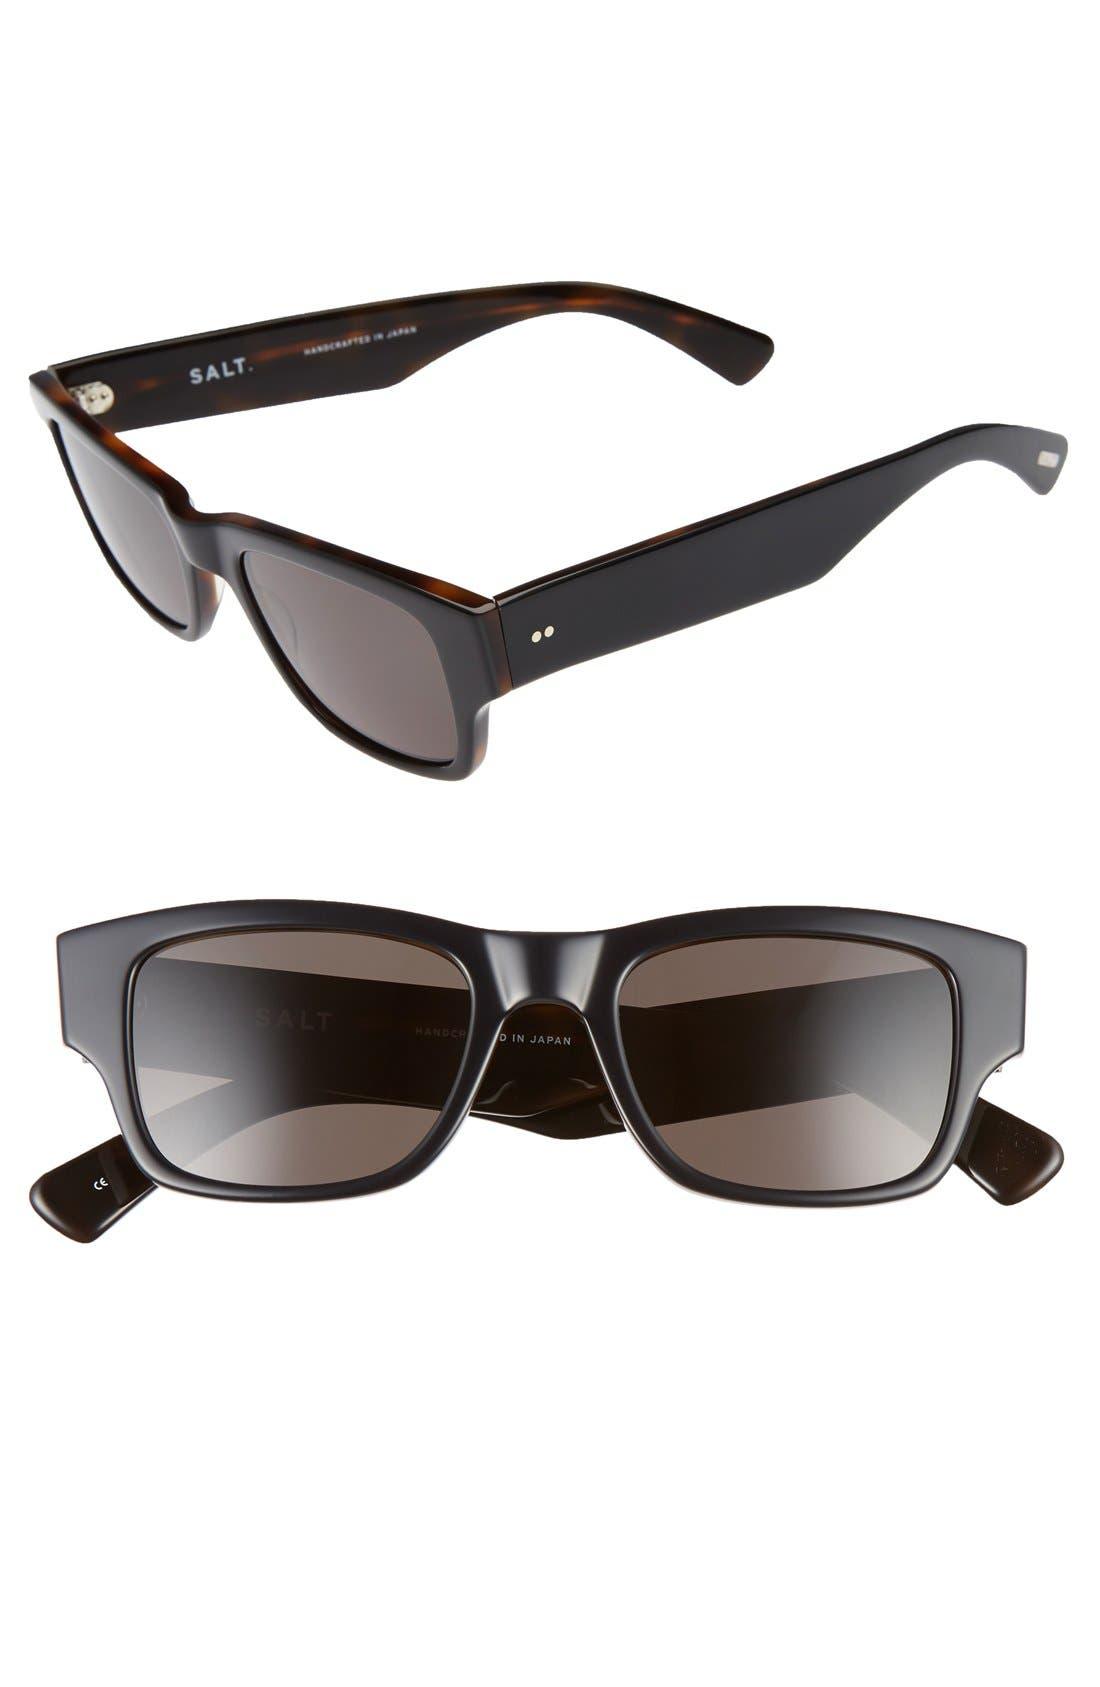 Nielsen 51mm Polarized Sunglasses,                             Main thumbnail 1, color,                             005